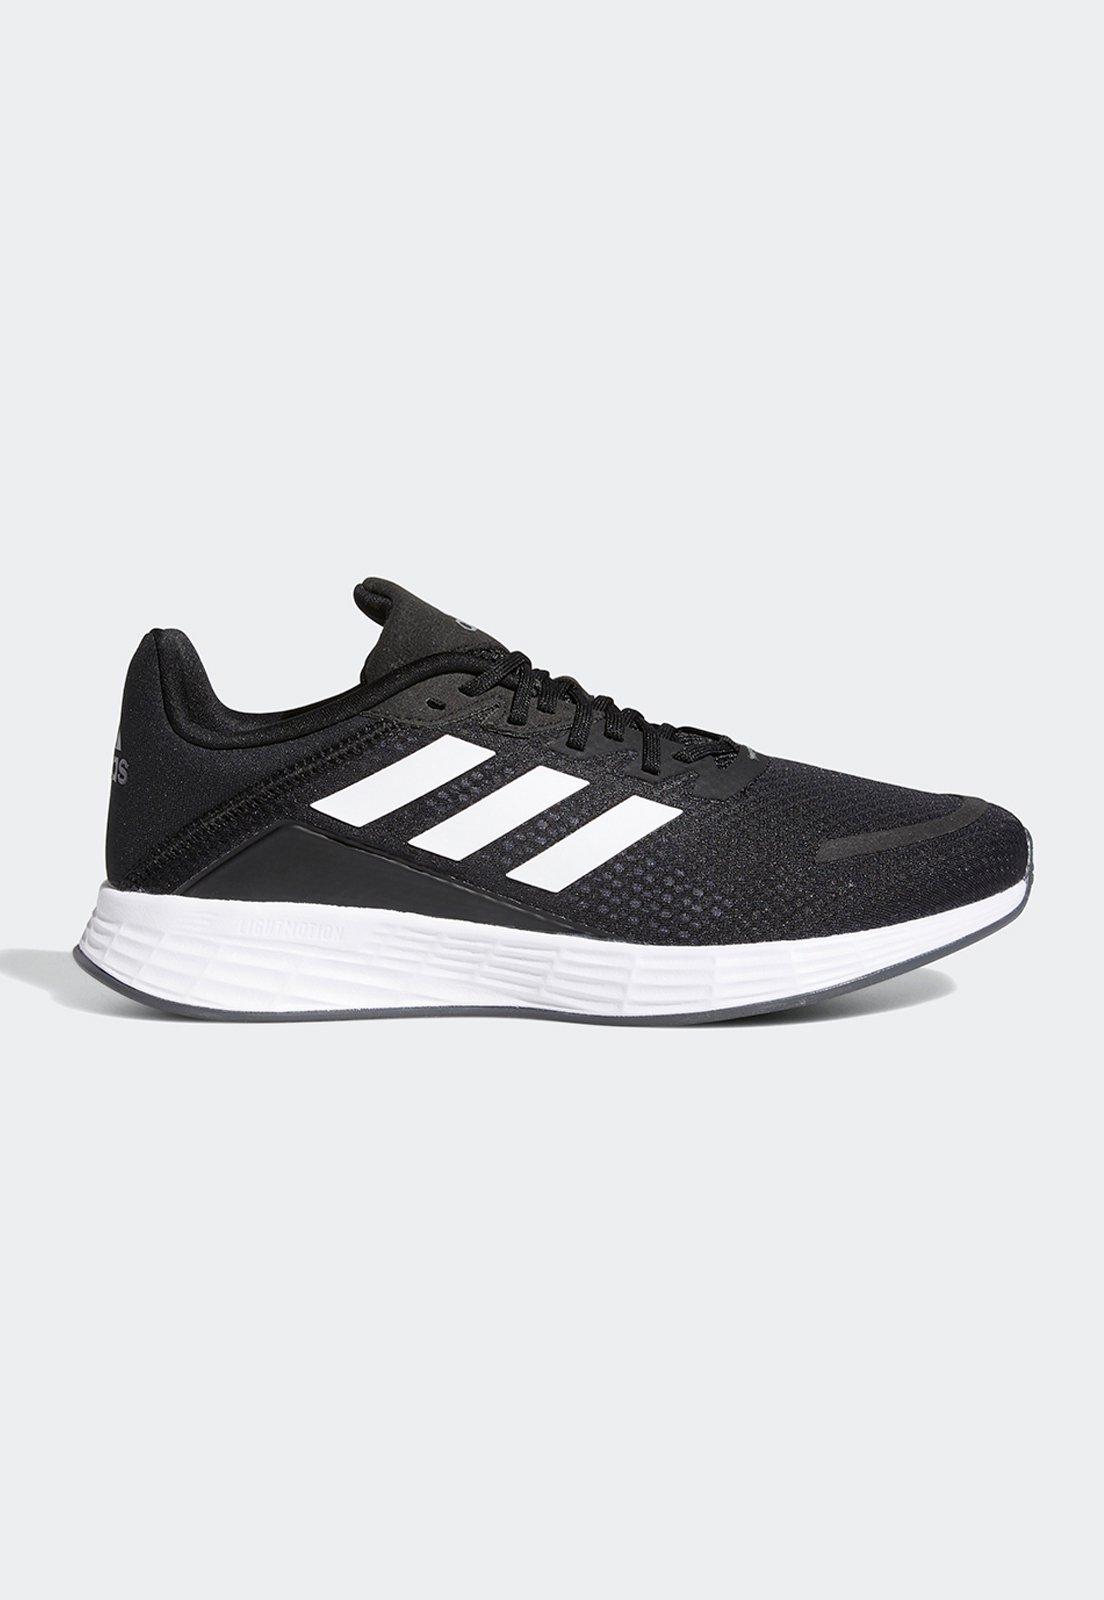 Tenis Running Negro-Blanco adidas Performance Duramo Sl